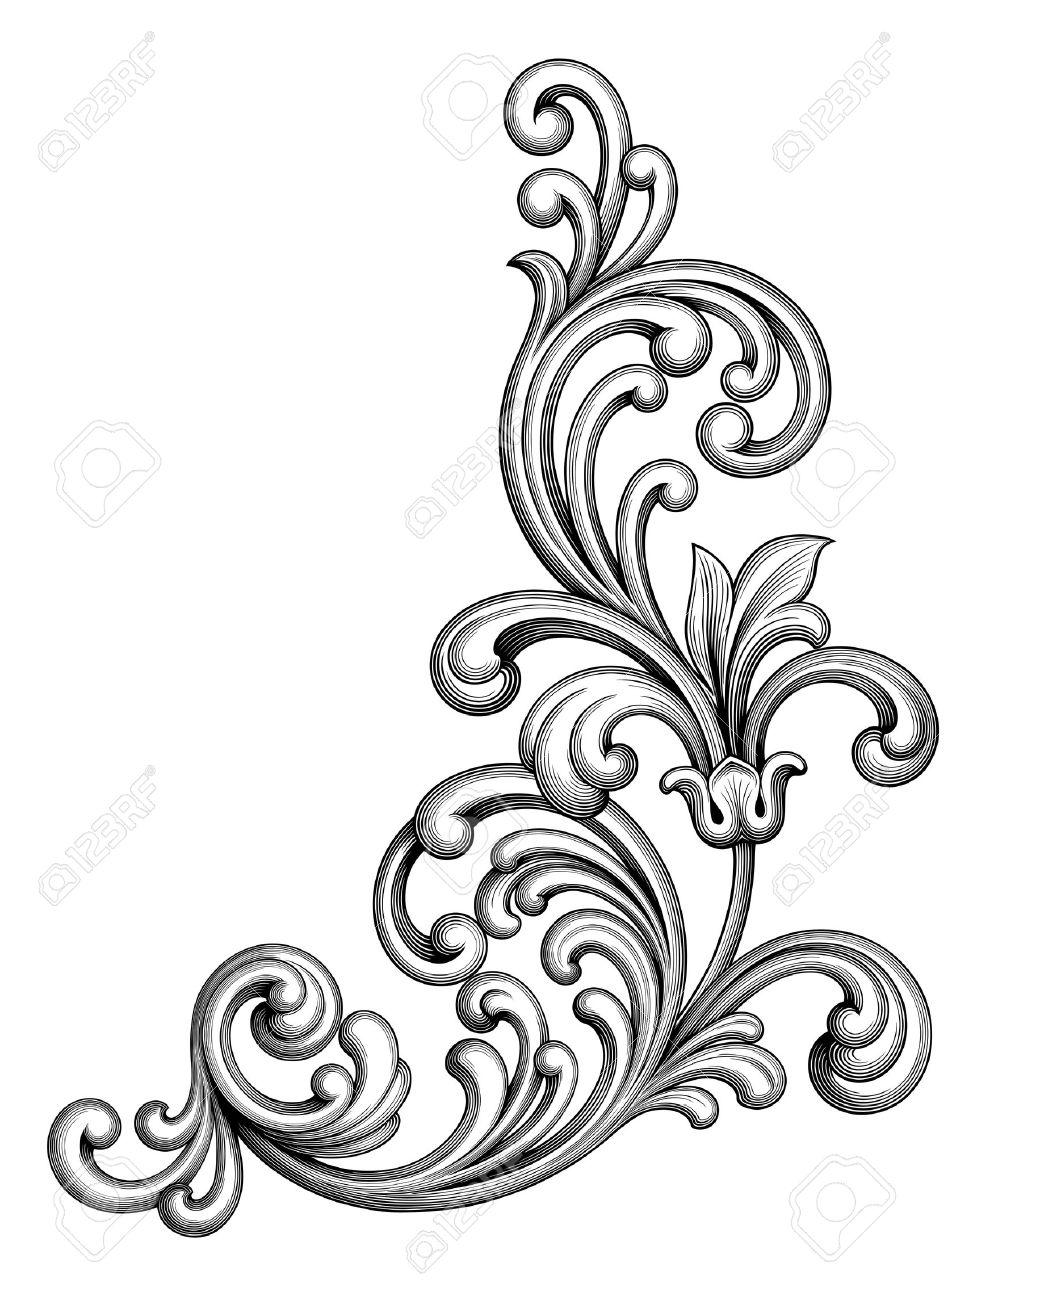 Vintage Baroque Victorian frame border monogram floral ornament leaf scroll engraved retro flower pattern decorative design tattoo black and white filigree calligraphic vector heraldic shield swirl - 52544229